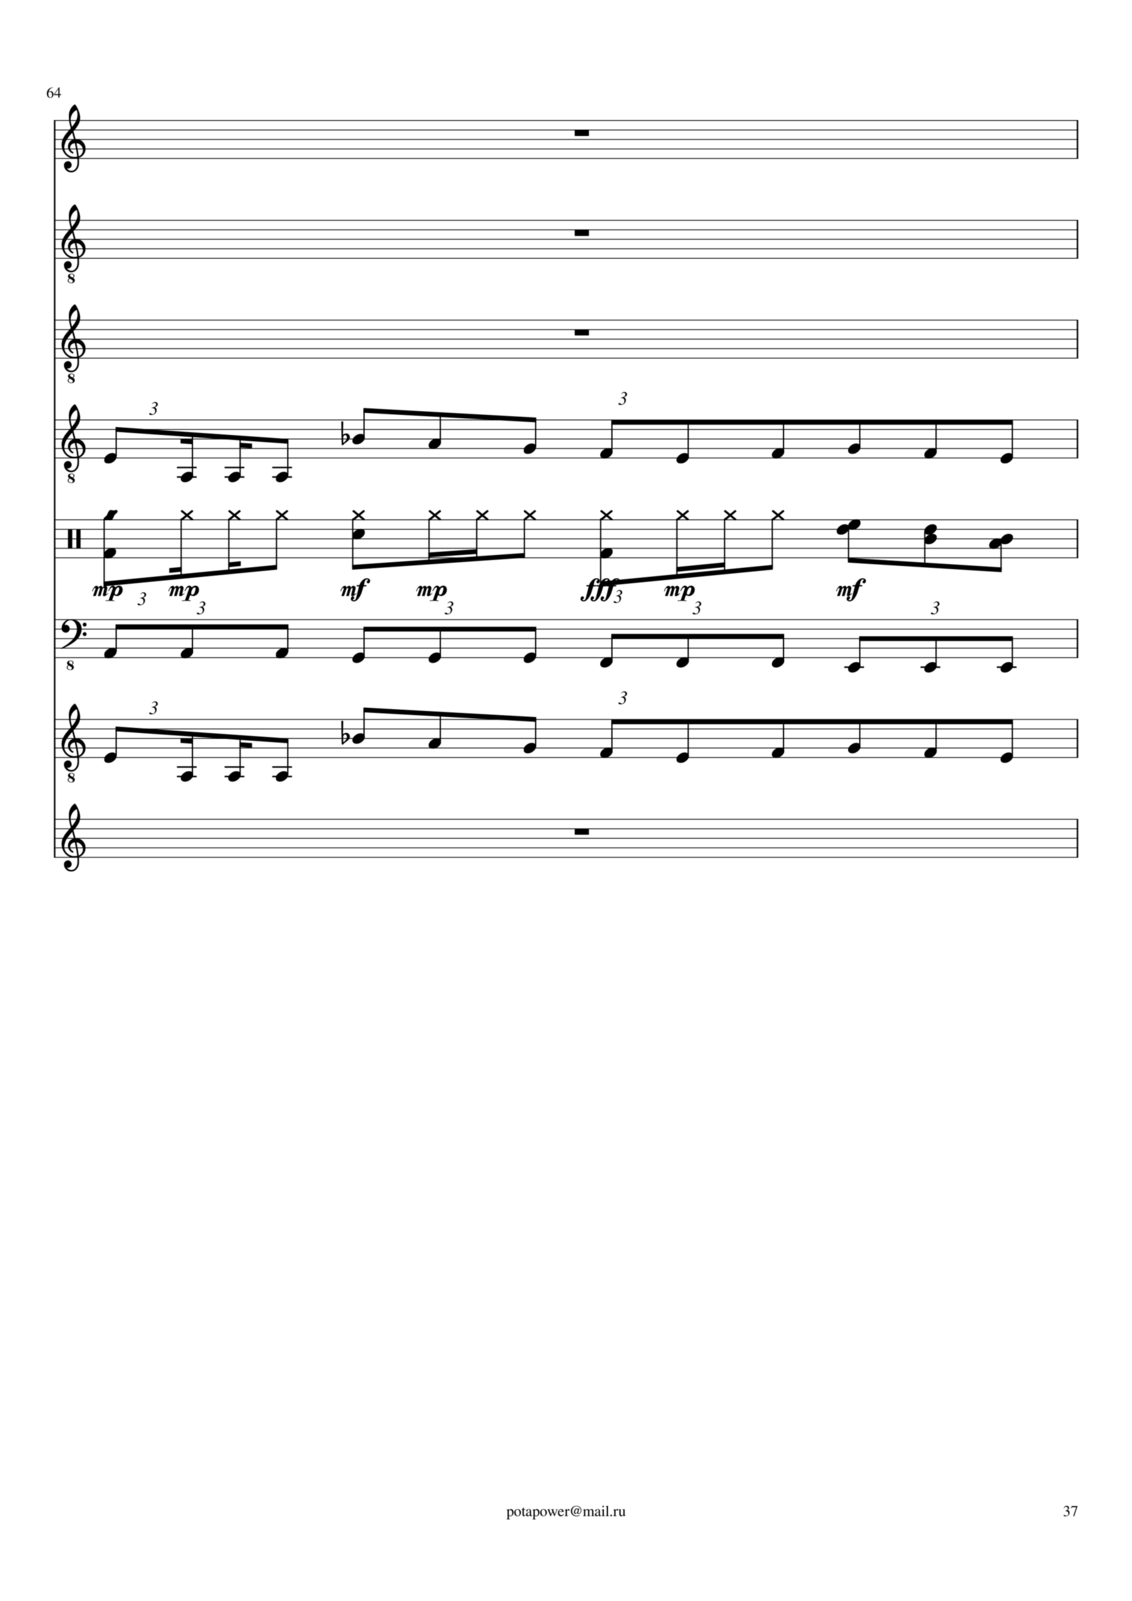 Korolevstvo slez slide, Image 37